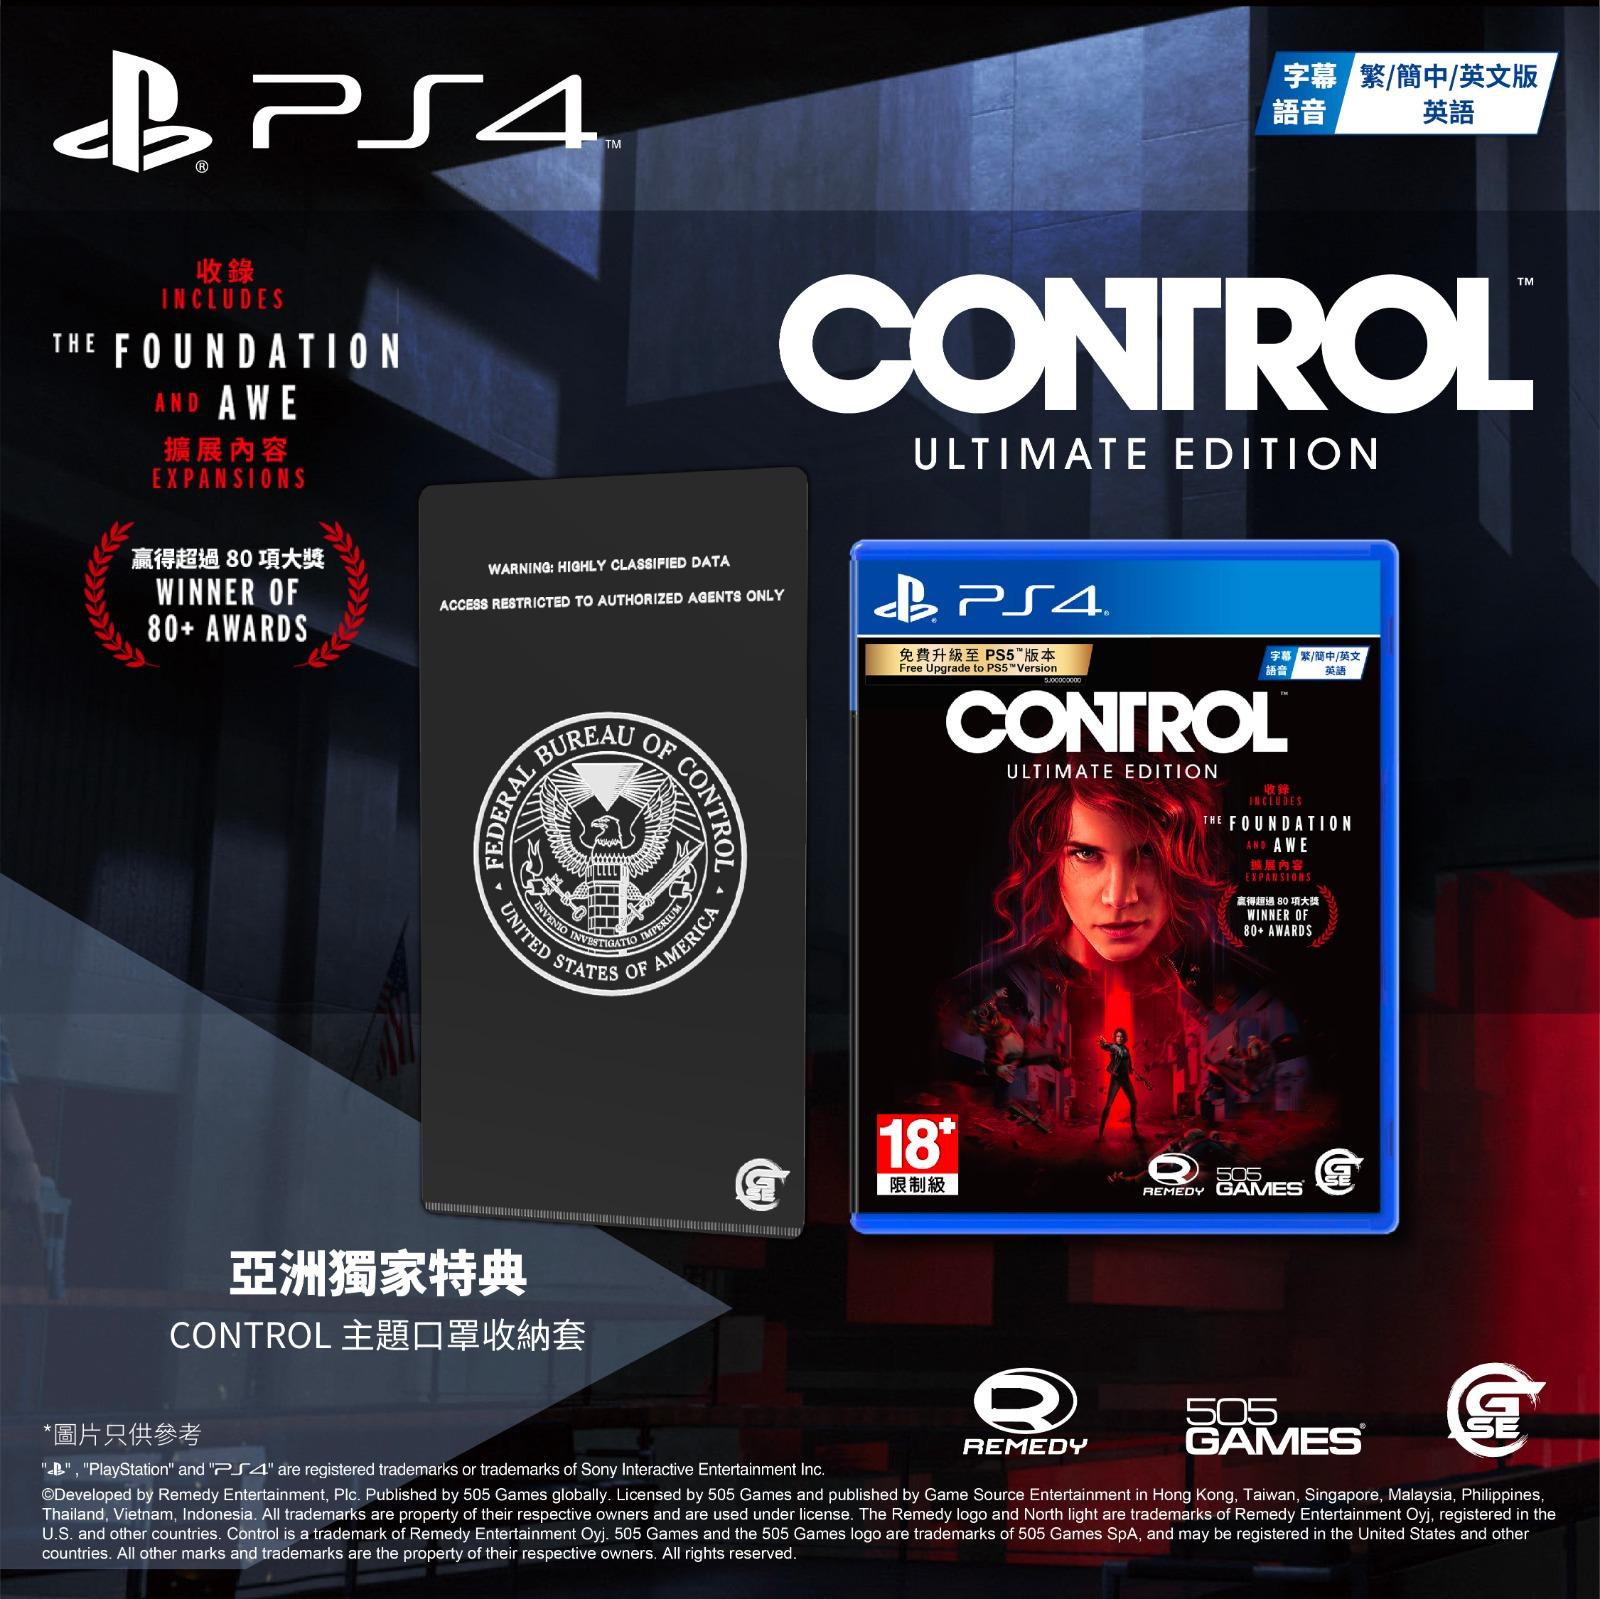 Control,控制,終極版,PS4,Remedy Entertainment,505 Games,GSE,